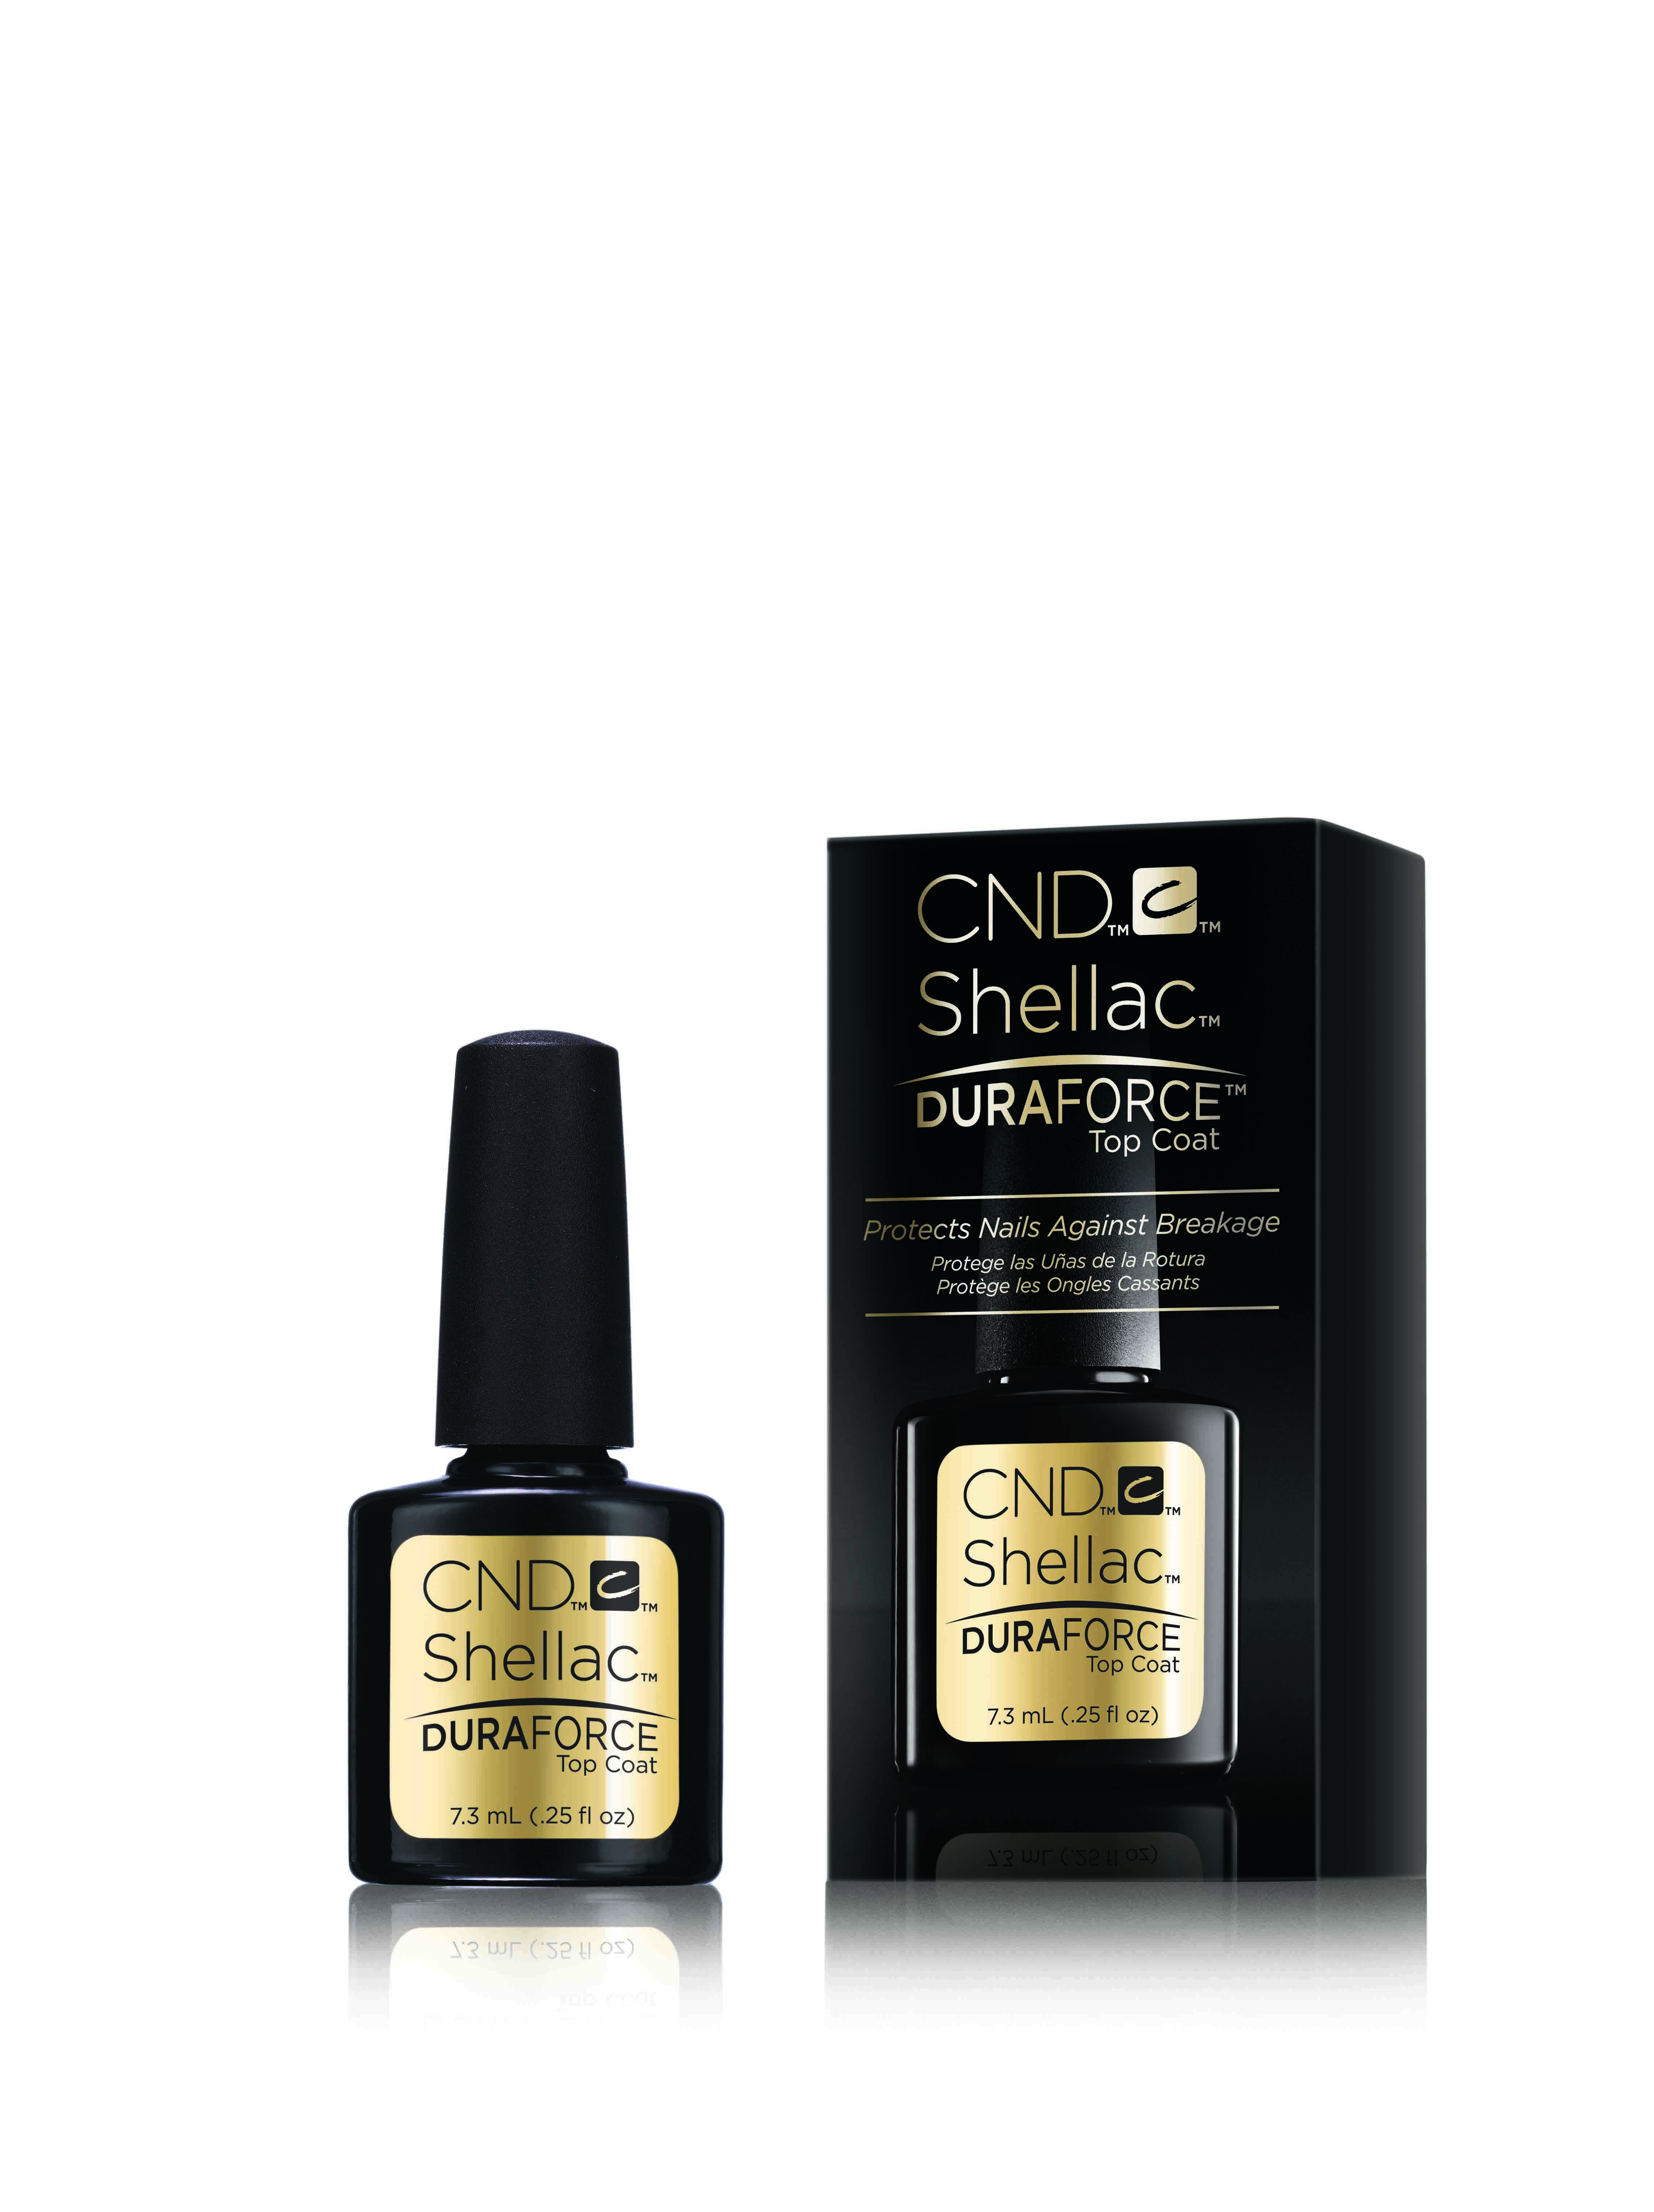 Cnd Creative Play Nail Lacquer Reviews In Nail Polish: CND Shellac Duraforce Top Coat Strengthens, Shines